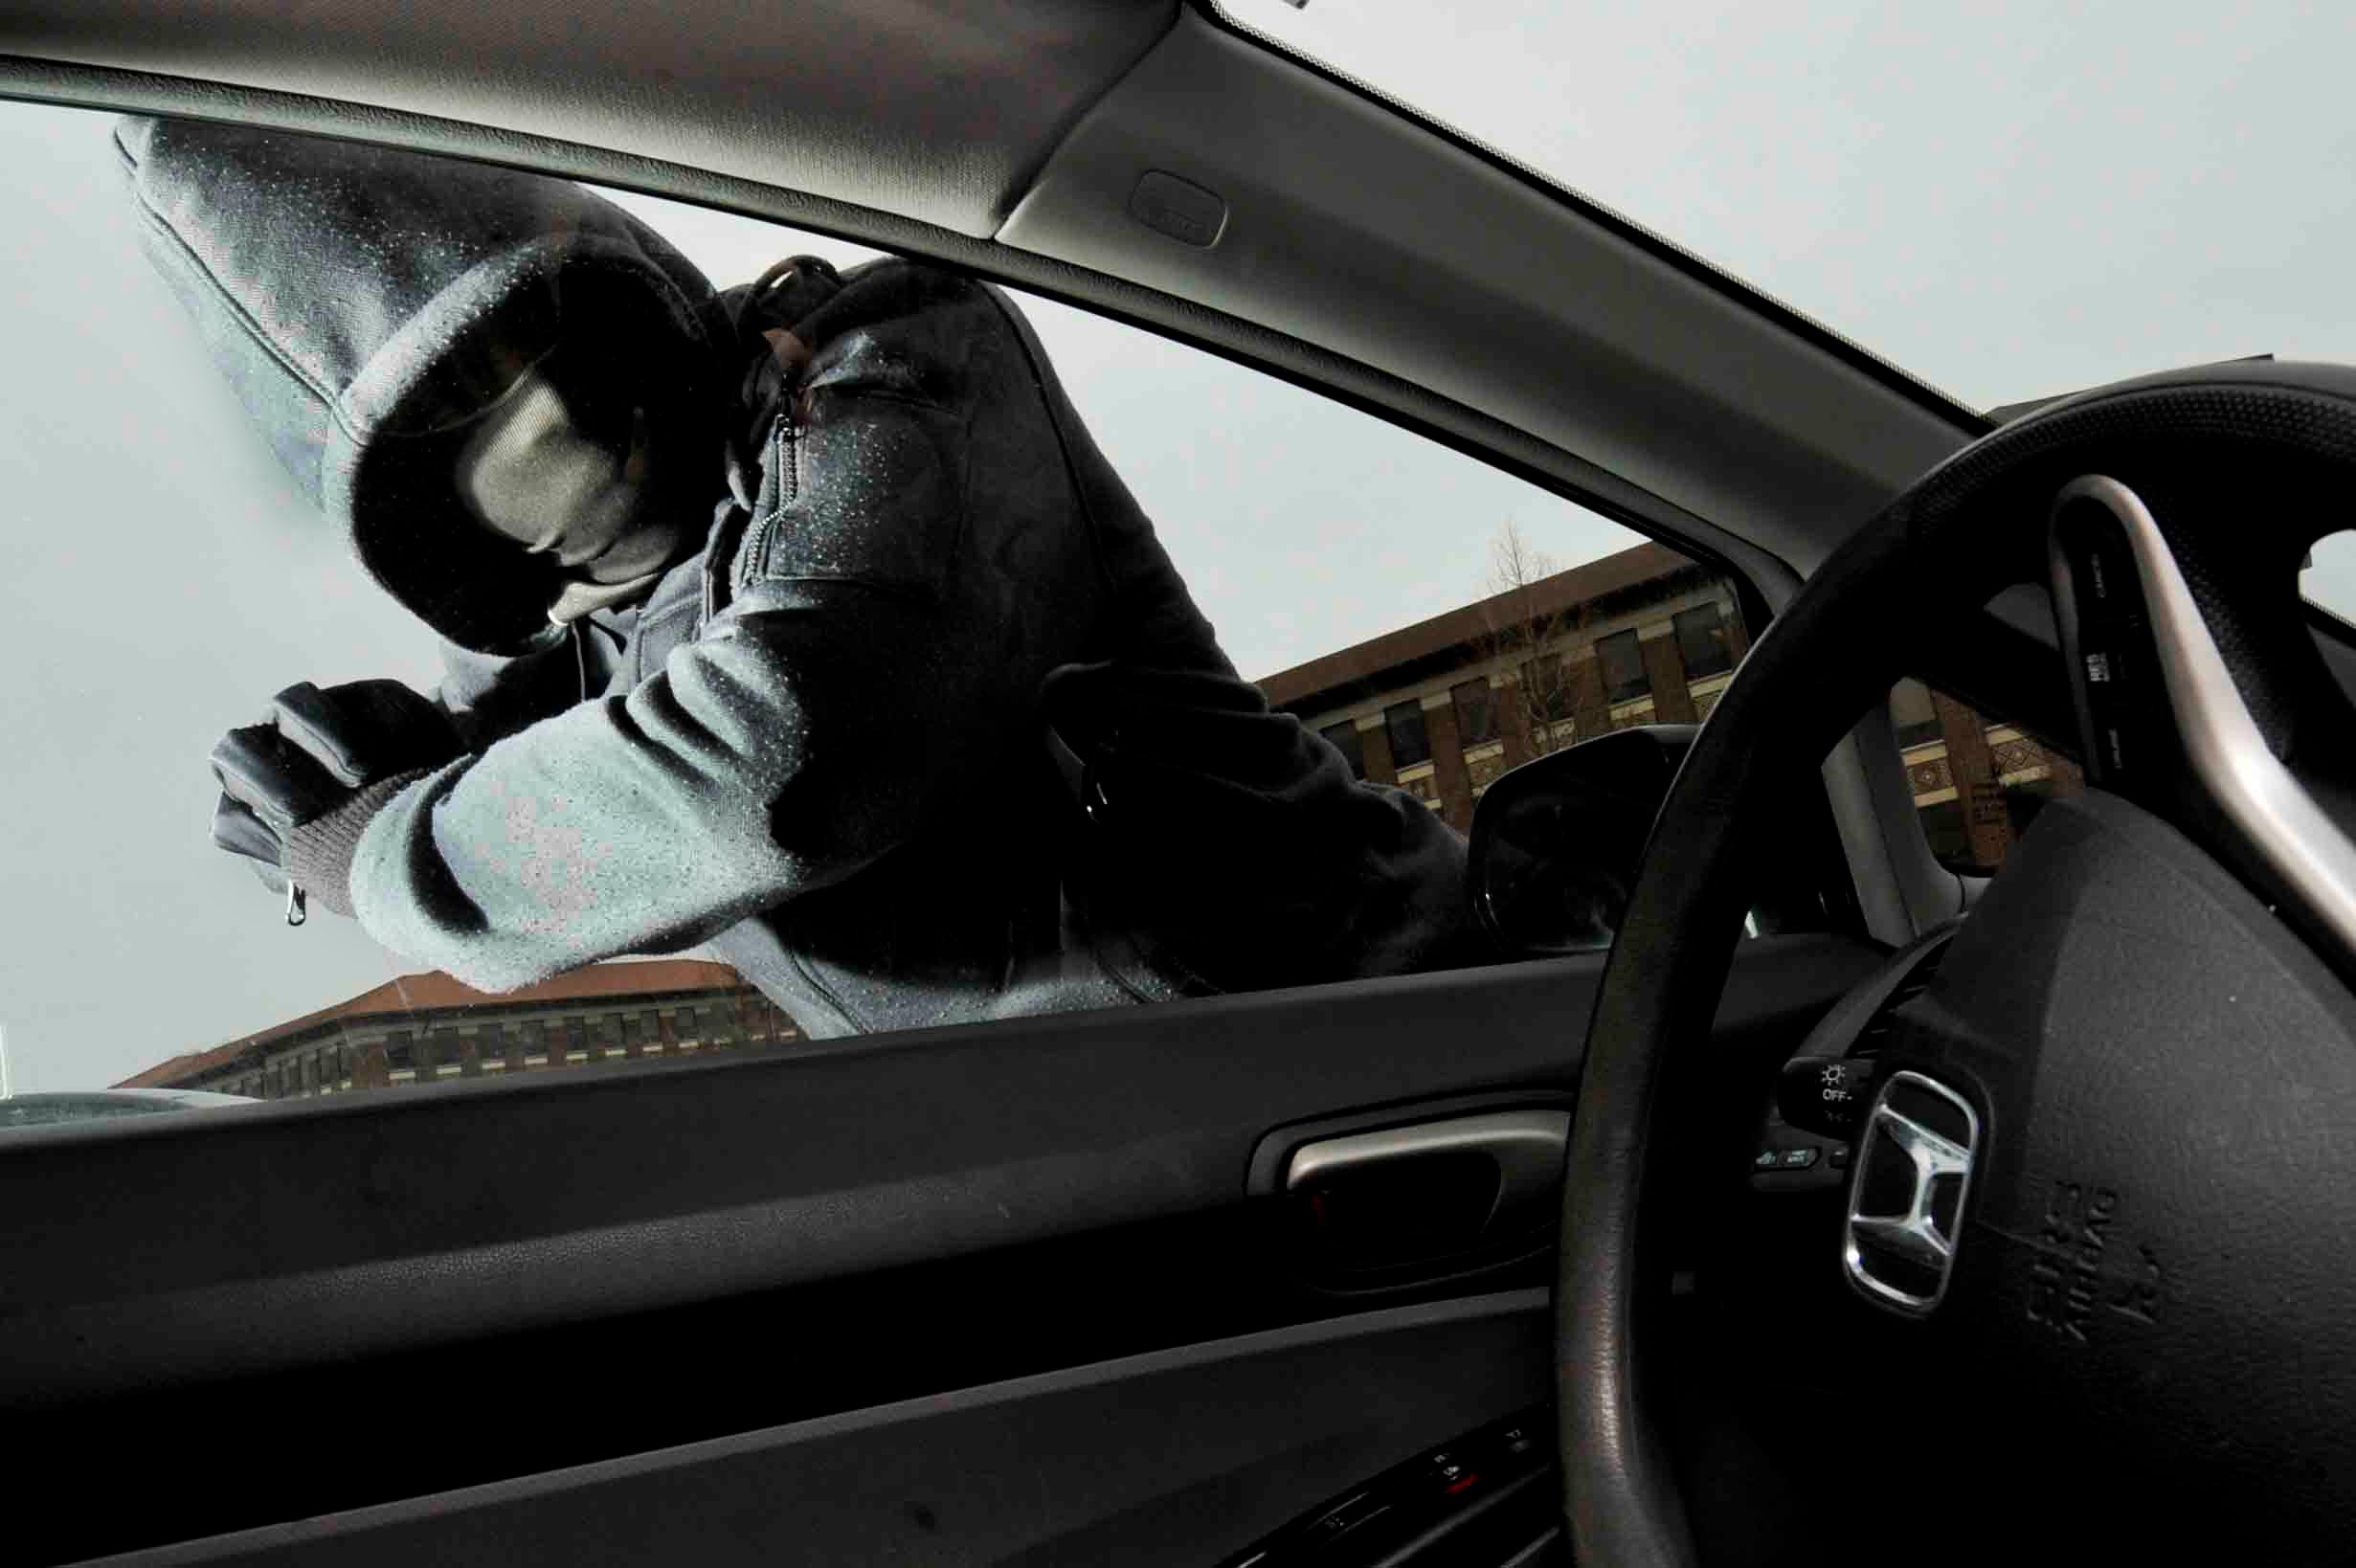 Thief attempting to break car window